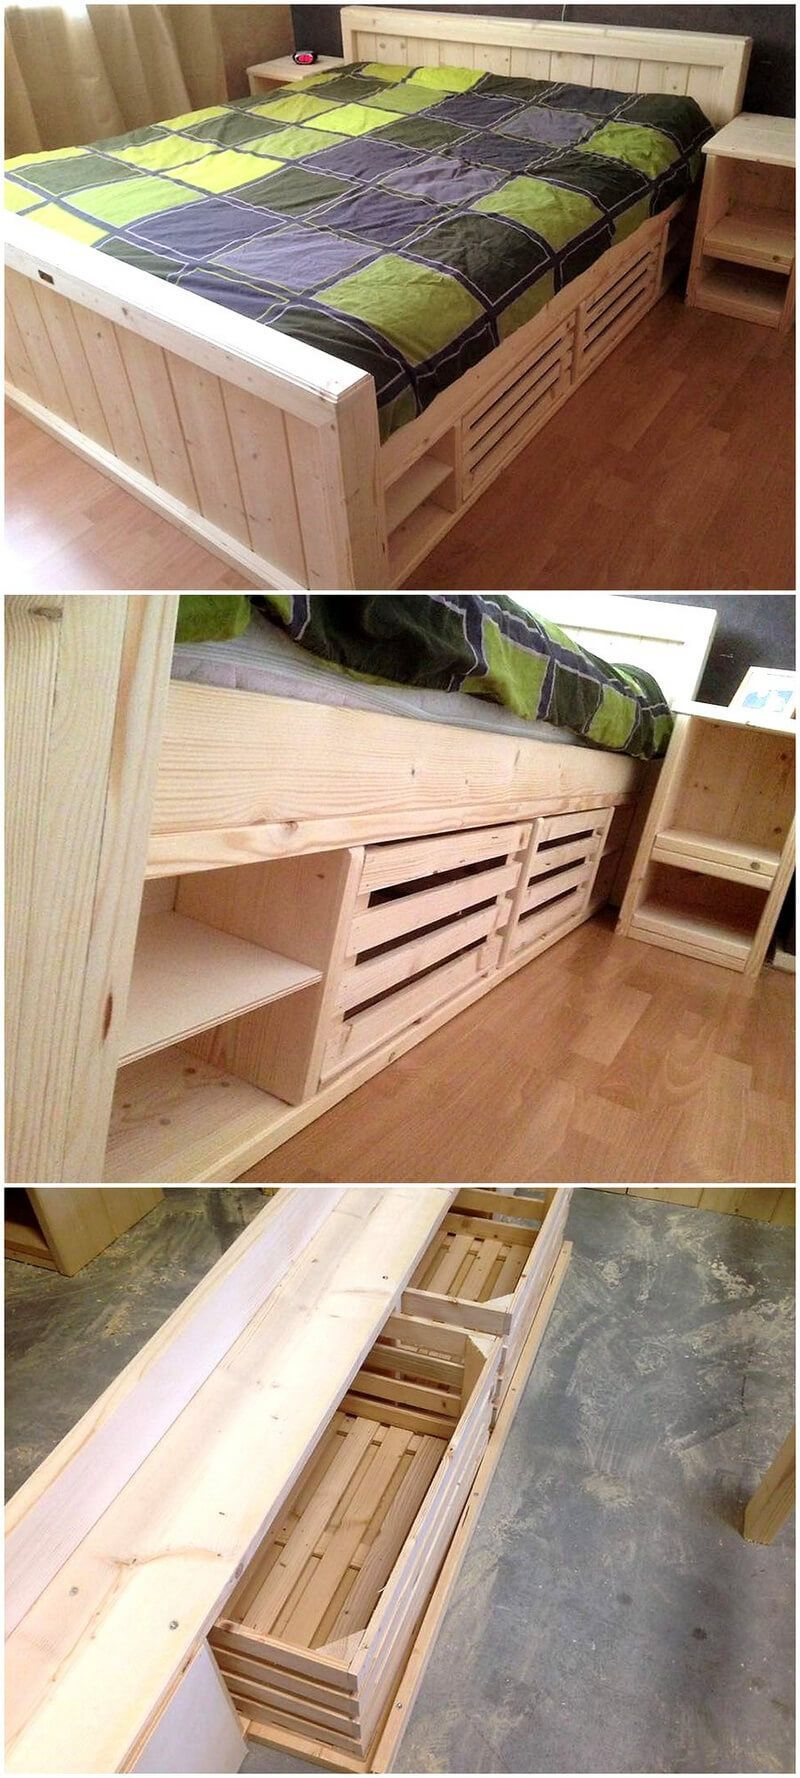 Pallets wooden giant bed bedroom in pinterest pallet